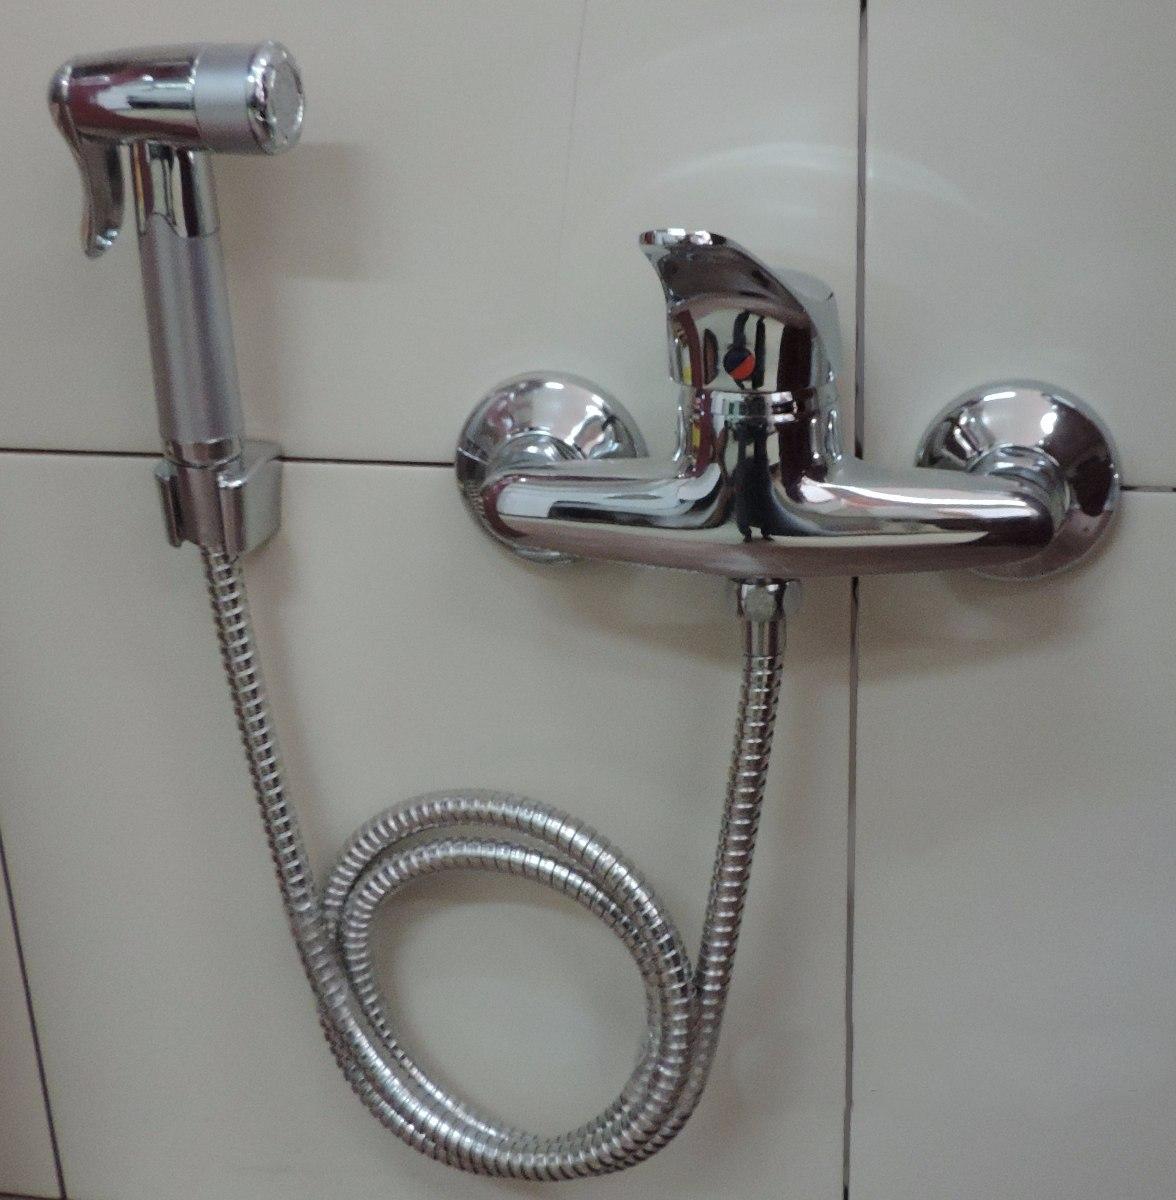 Bidet ducha higi nica grifer a ba o a7 ceramicasuy for Llaves para duchas sodimac